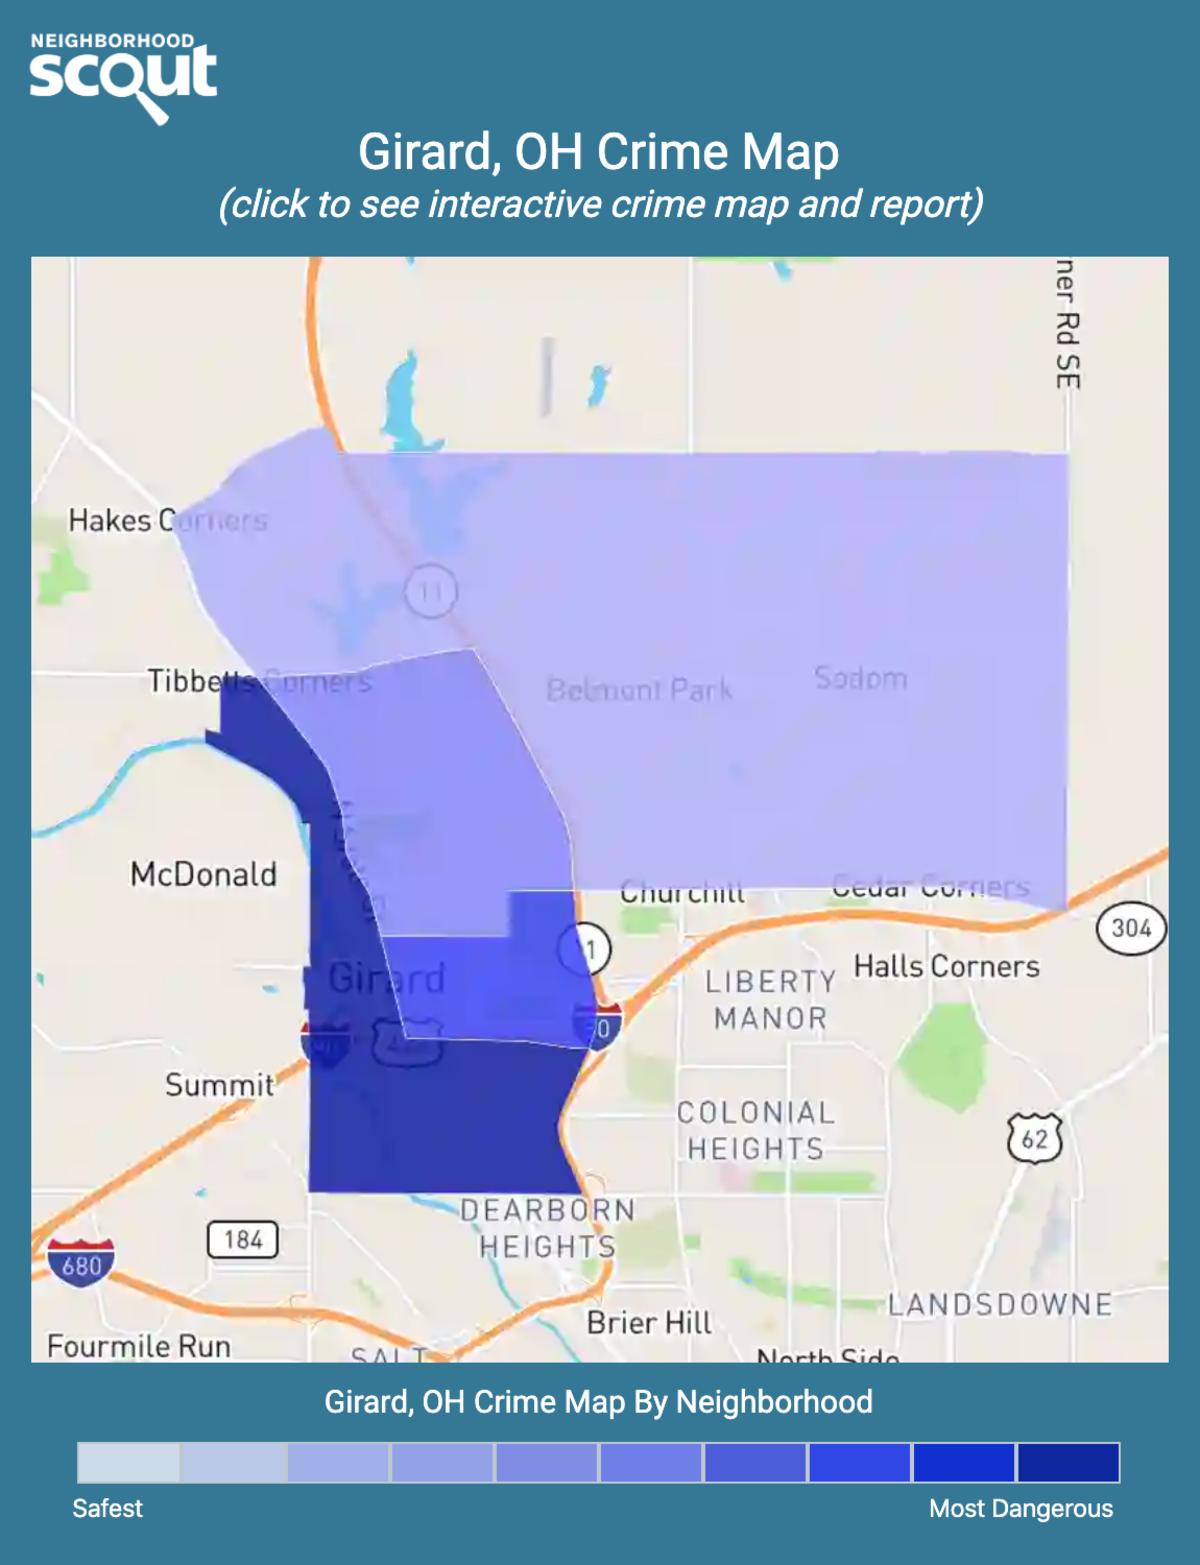 Girard, Ohio crime map